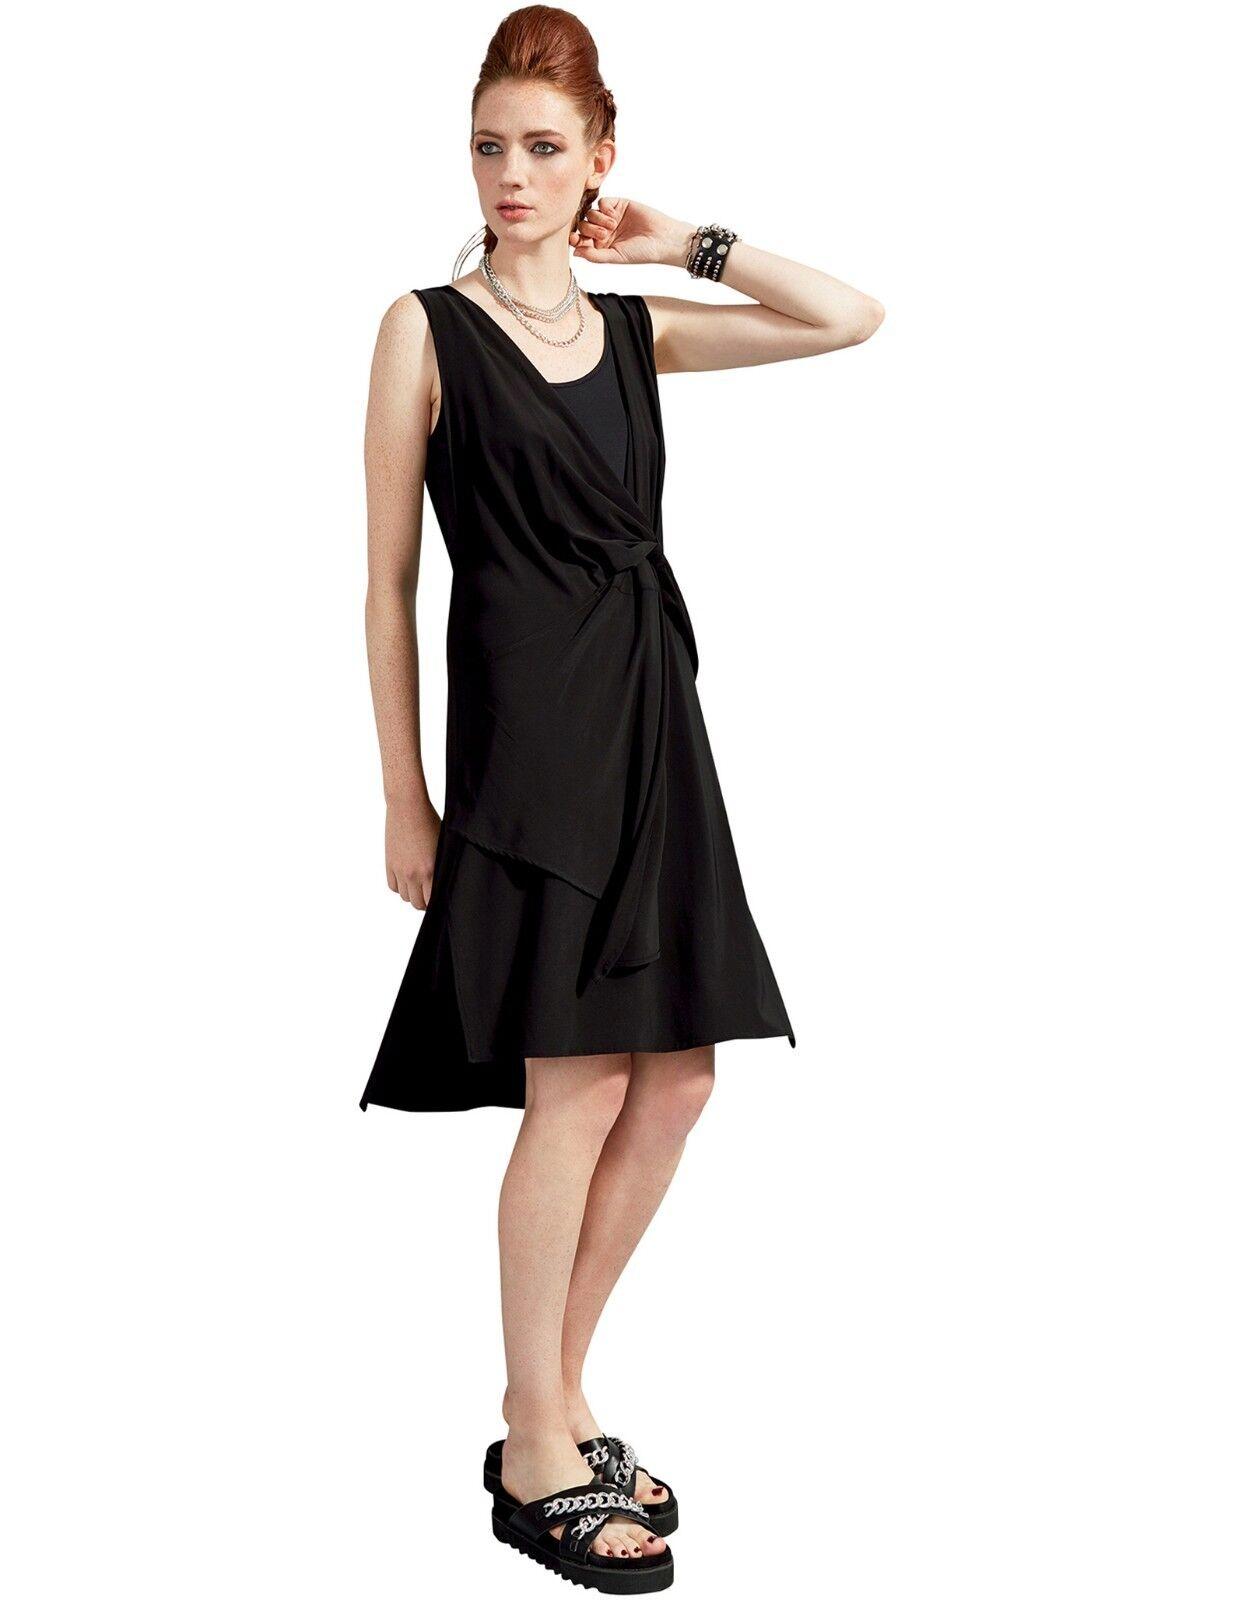 Beautiful Stylish Authentic Größe 2 MCPlanet by Innate Dress ANITAS orig.